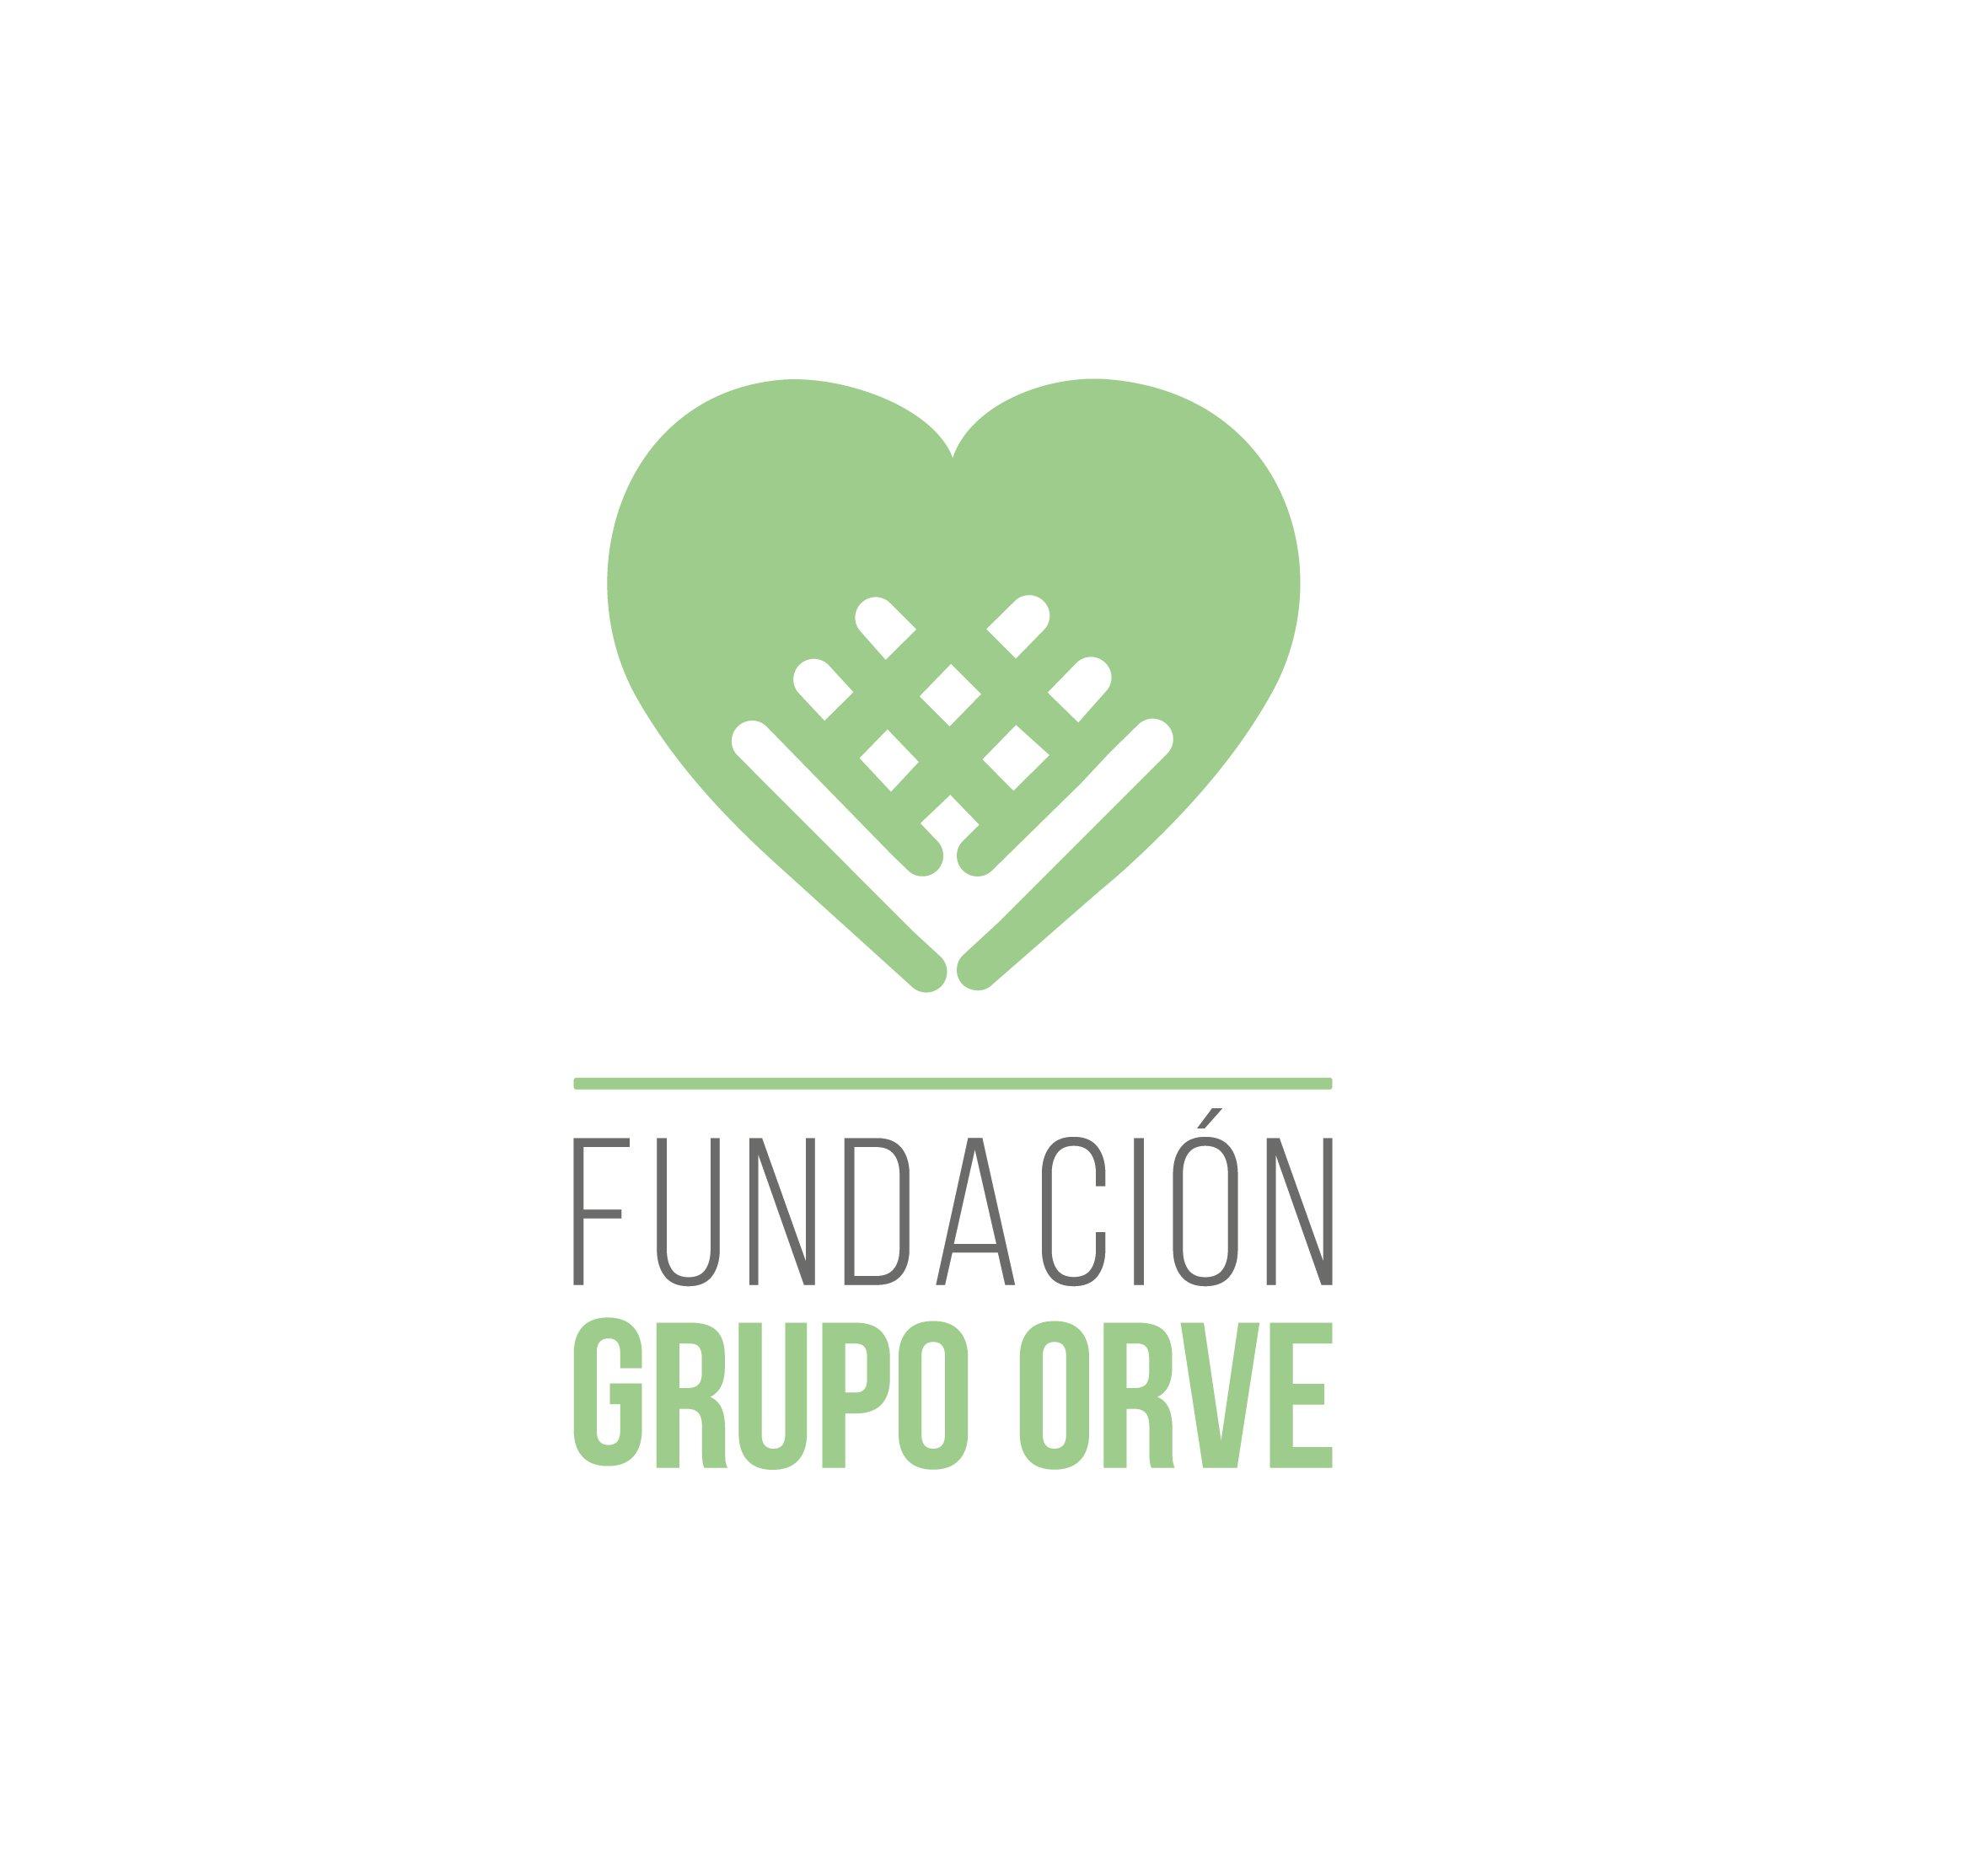 Fundacion GRUPO ORVE 1